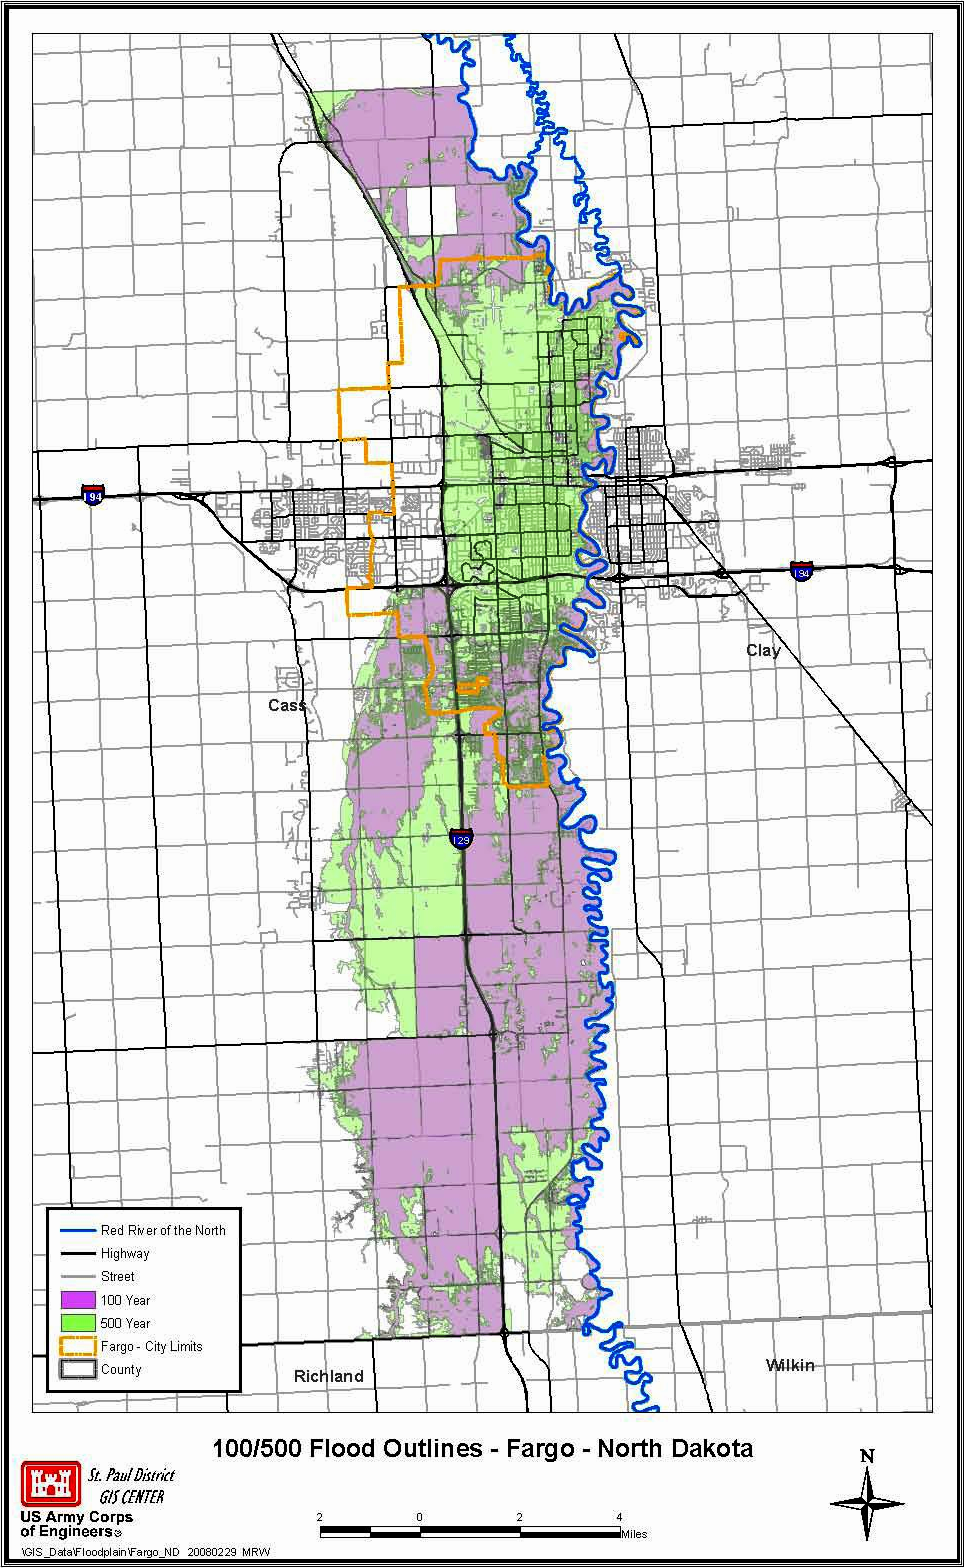 FloodOutline100vs500  Year Floodplain Map on swamp maps, mountain maps, marsh maps, dune maps, desert maps, wetland maps, coastal maps, rural area maps, cave maps, aquifer maps,